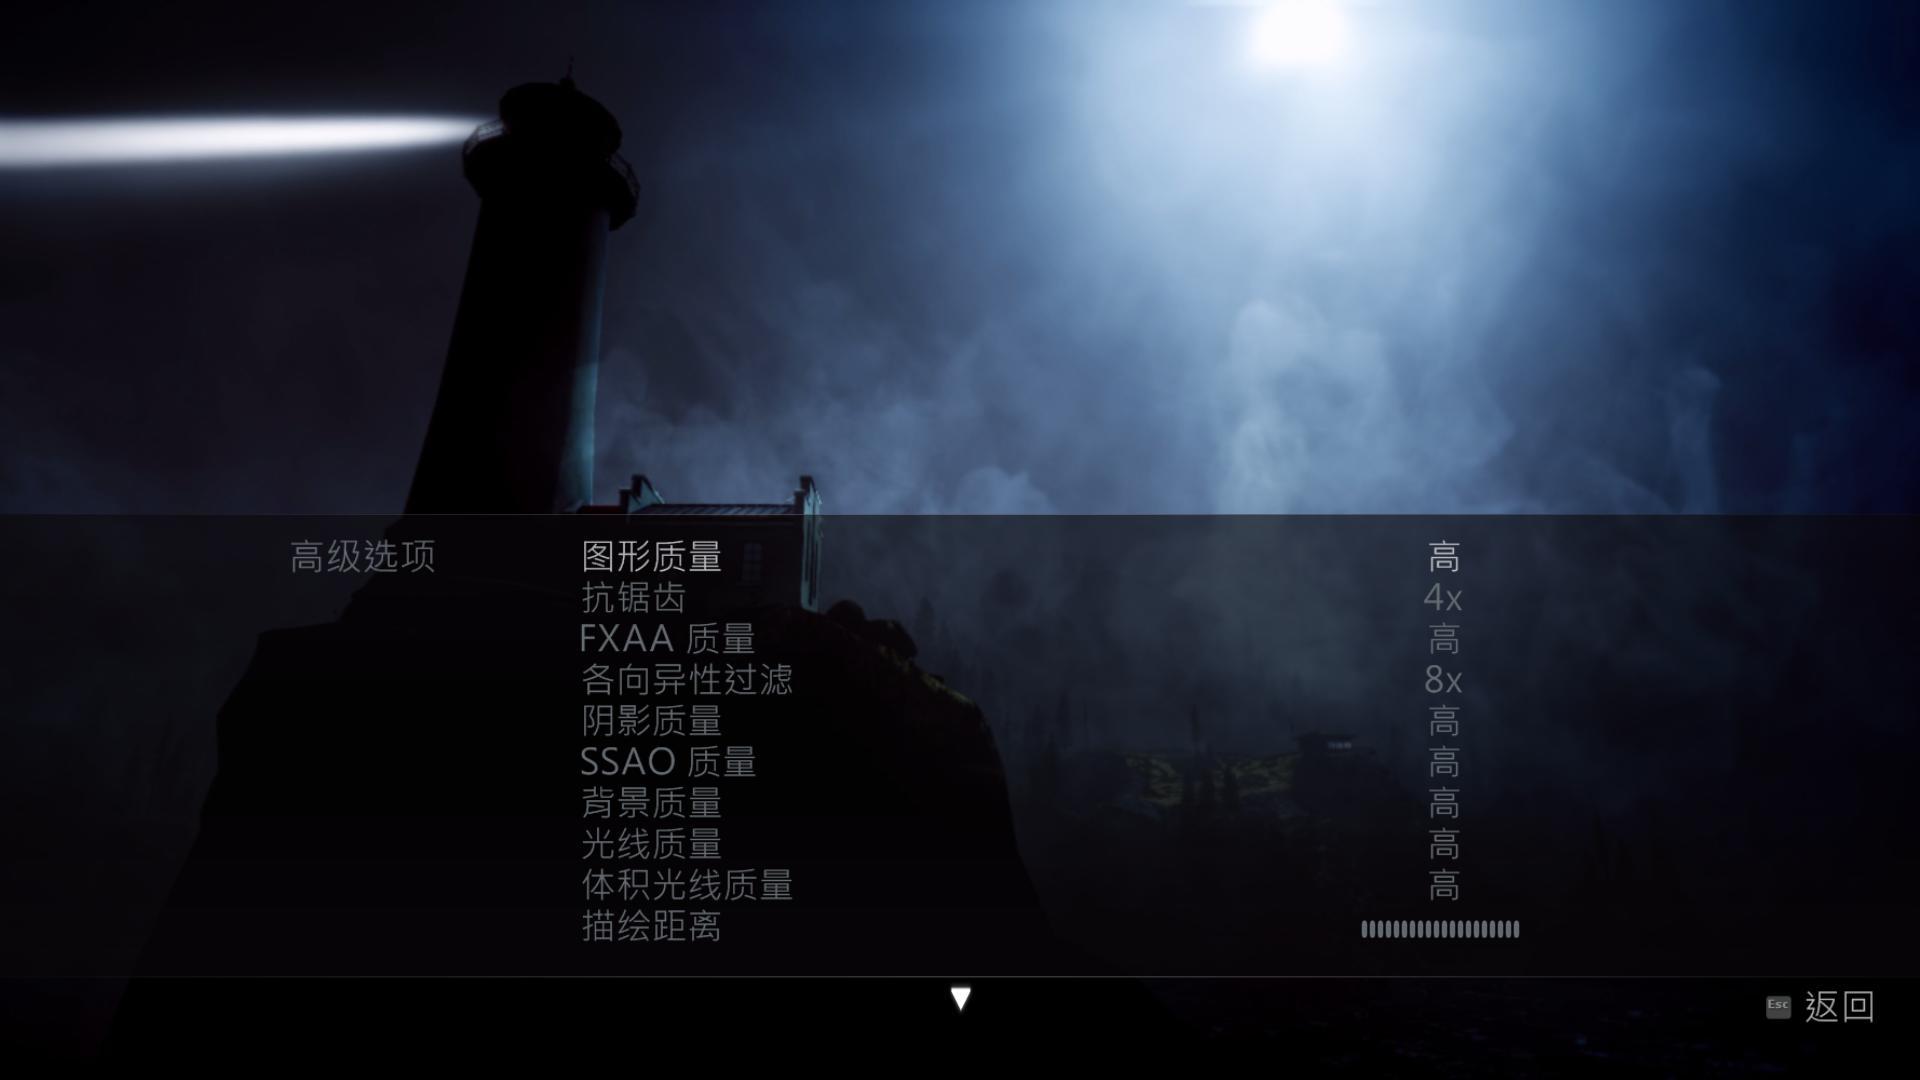 心灵杀手/阿兰醒醒 /Alan Wake插图